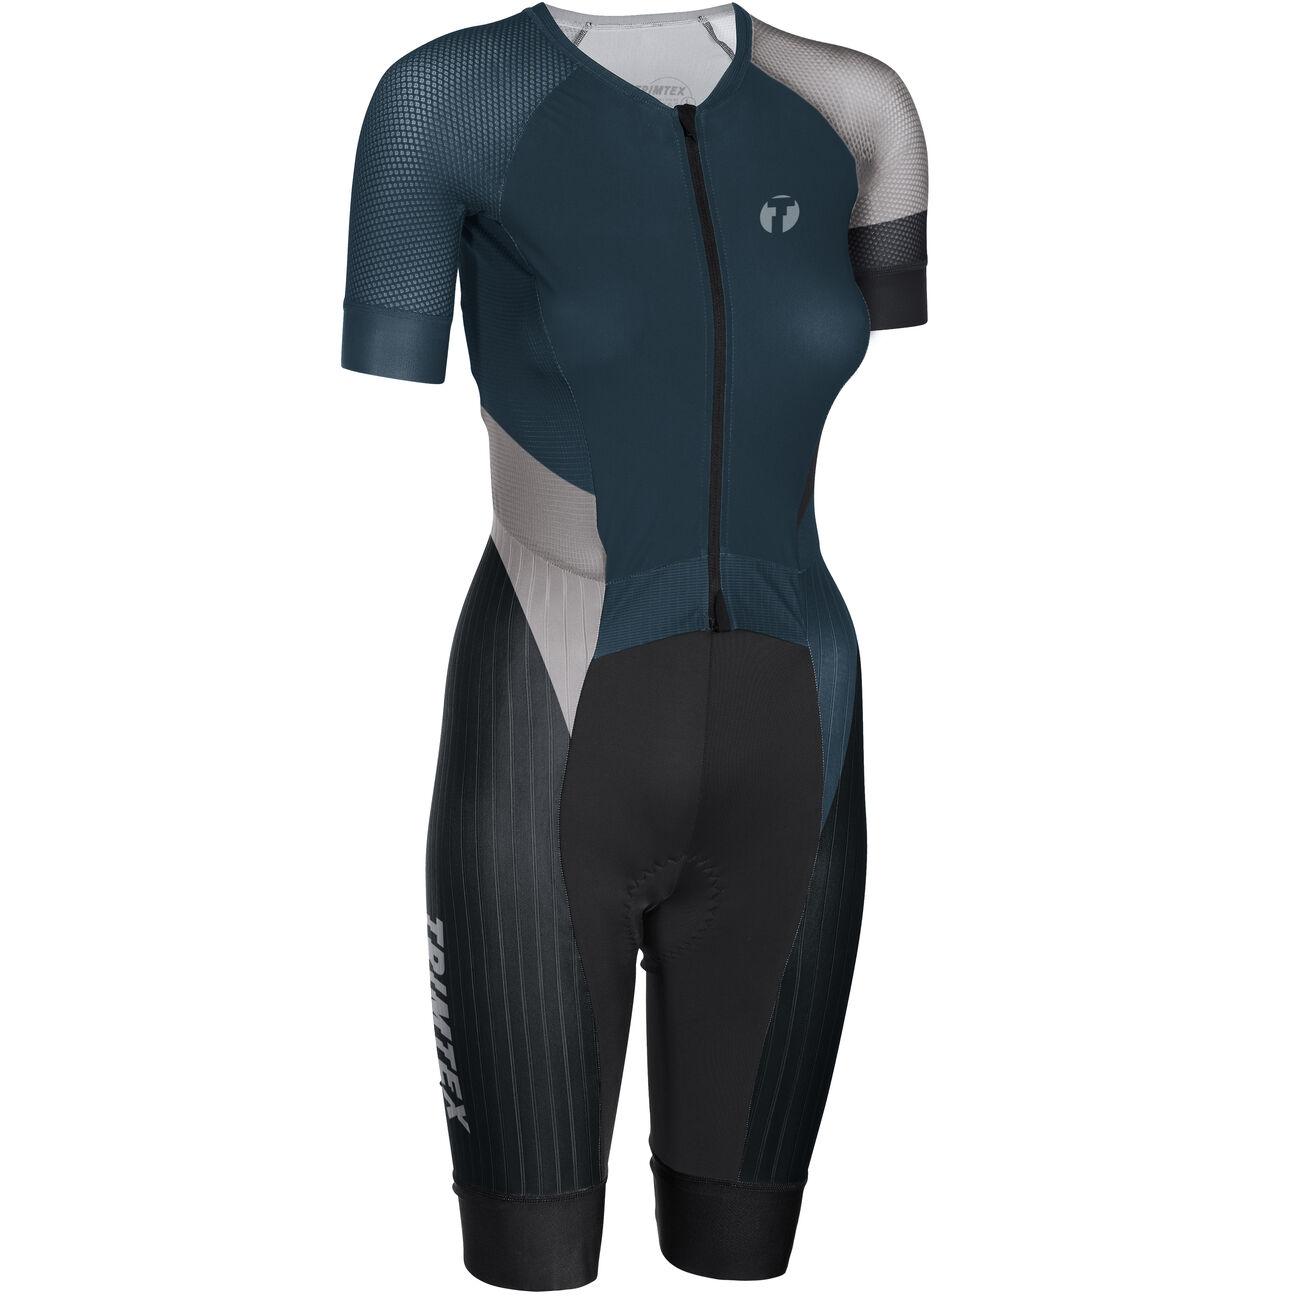 Aero 2.0 Tri Speedsuit MD women`s